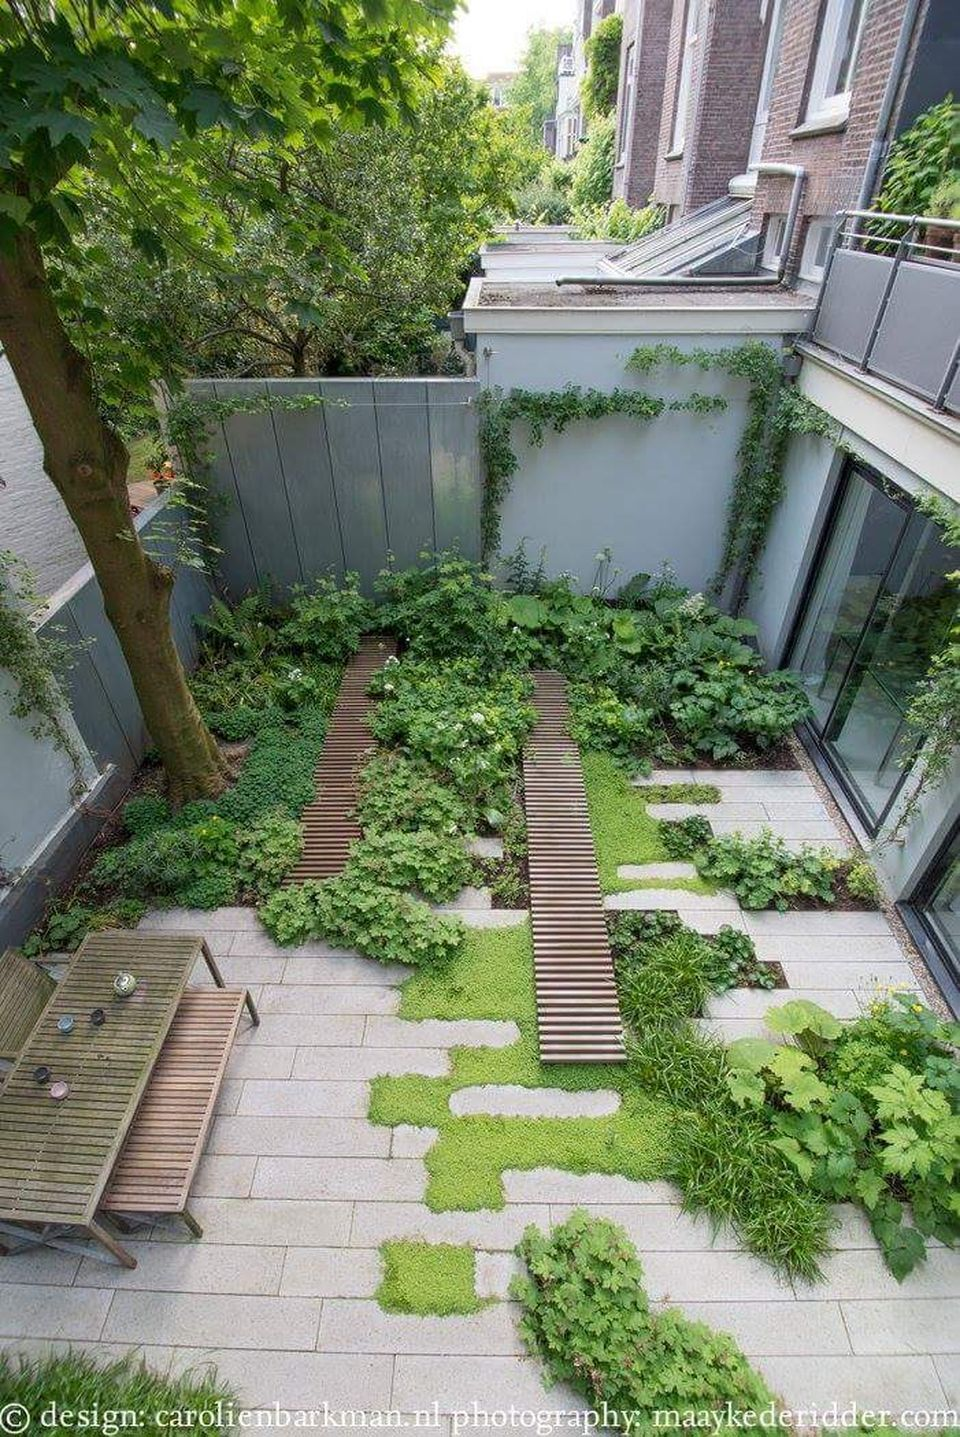 a0e99f9a001676a8844979b6b66e9eb3 - The History Of Landscape Design In 100 Gardens